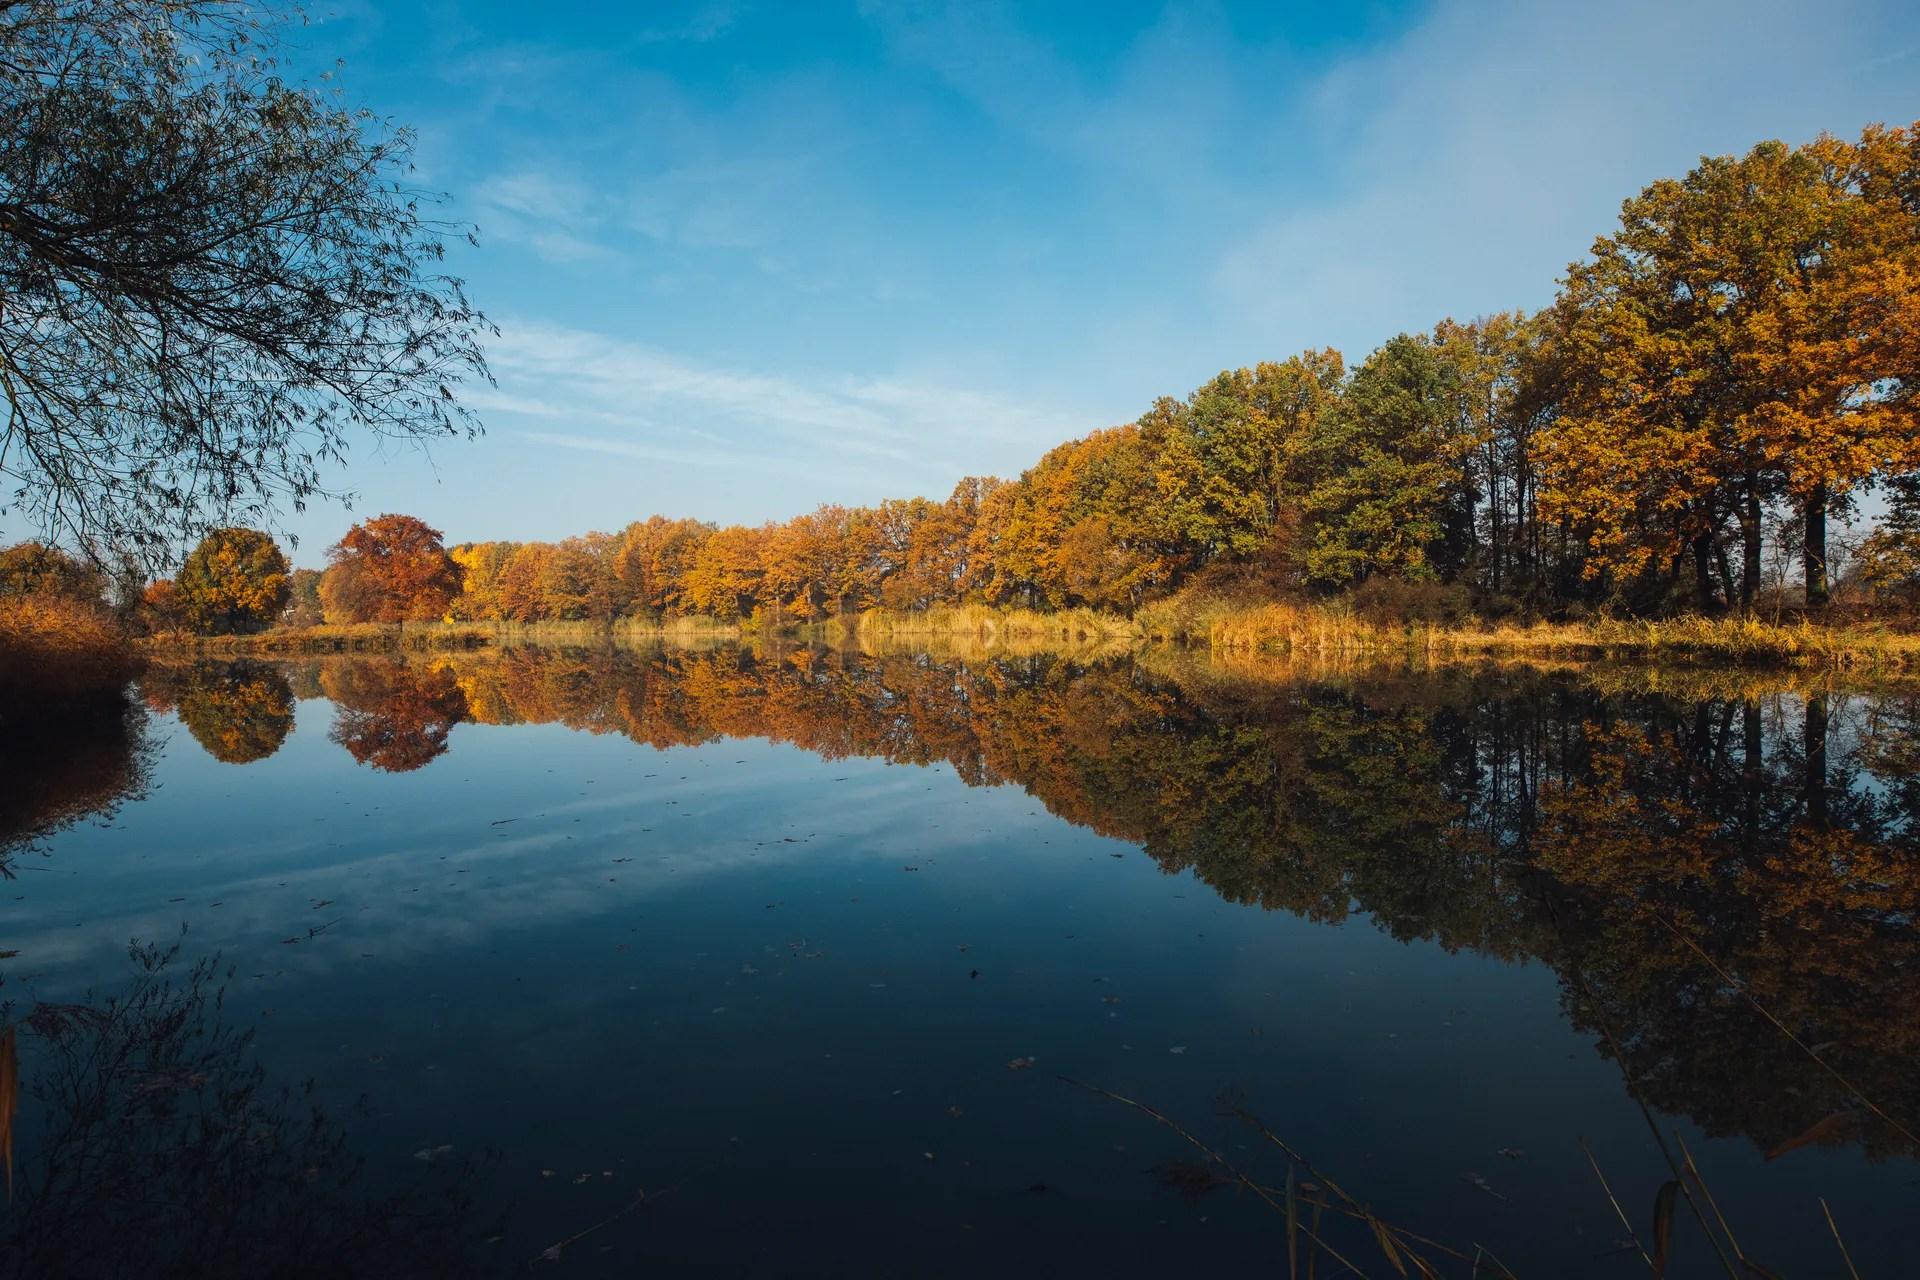 Rain Fall On Flowers Wallpaper The Beauty Of Autumn Widescreen Wallpaper Wide